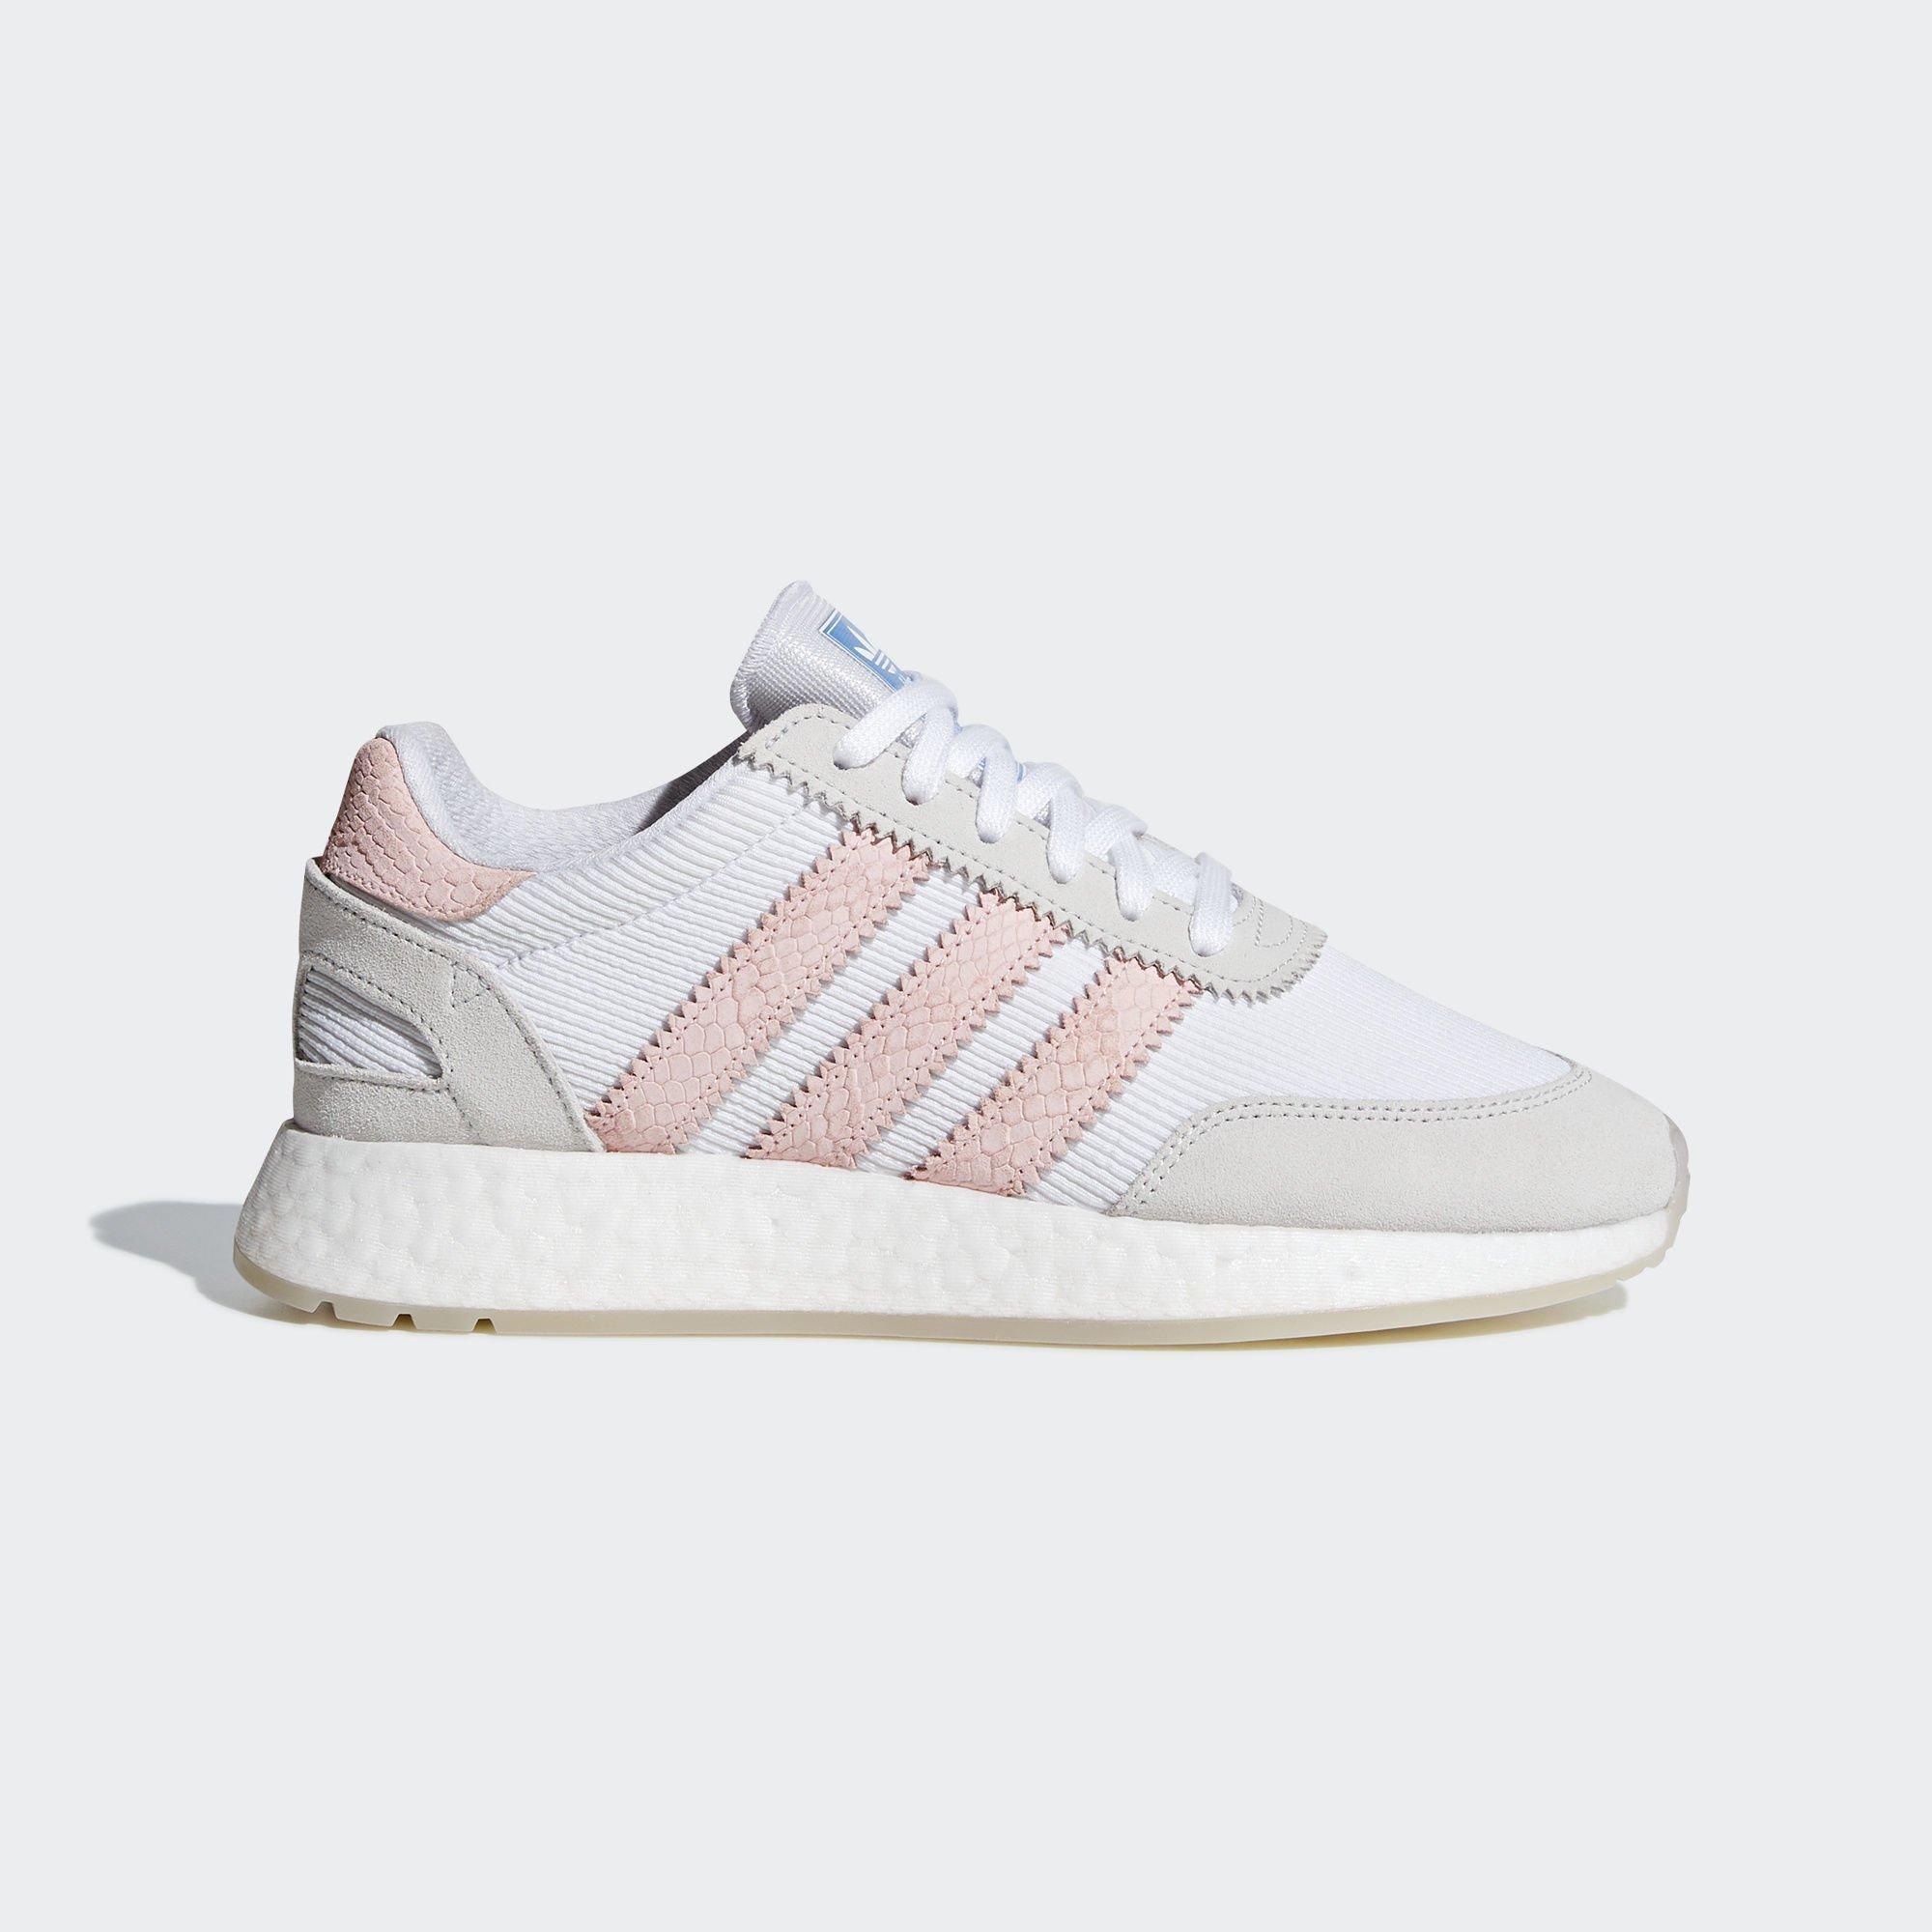 adidas I-5923 'Ice Pink' (D97348)